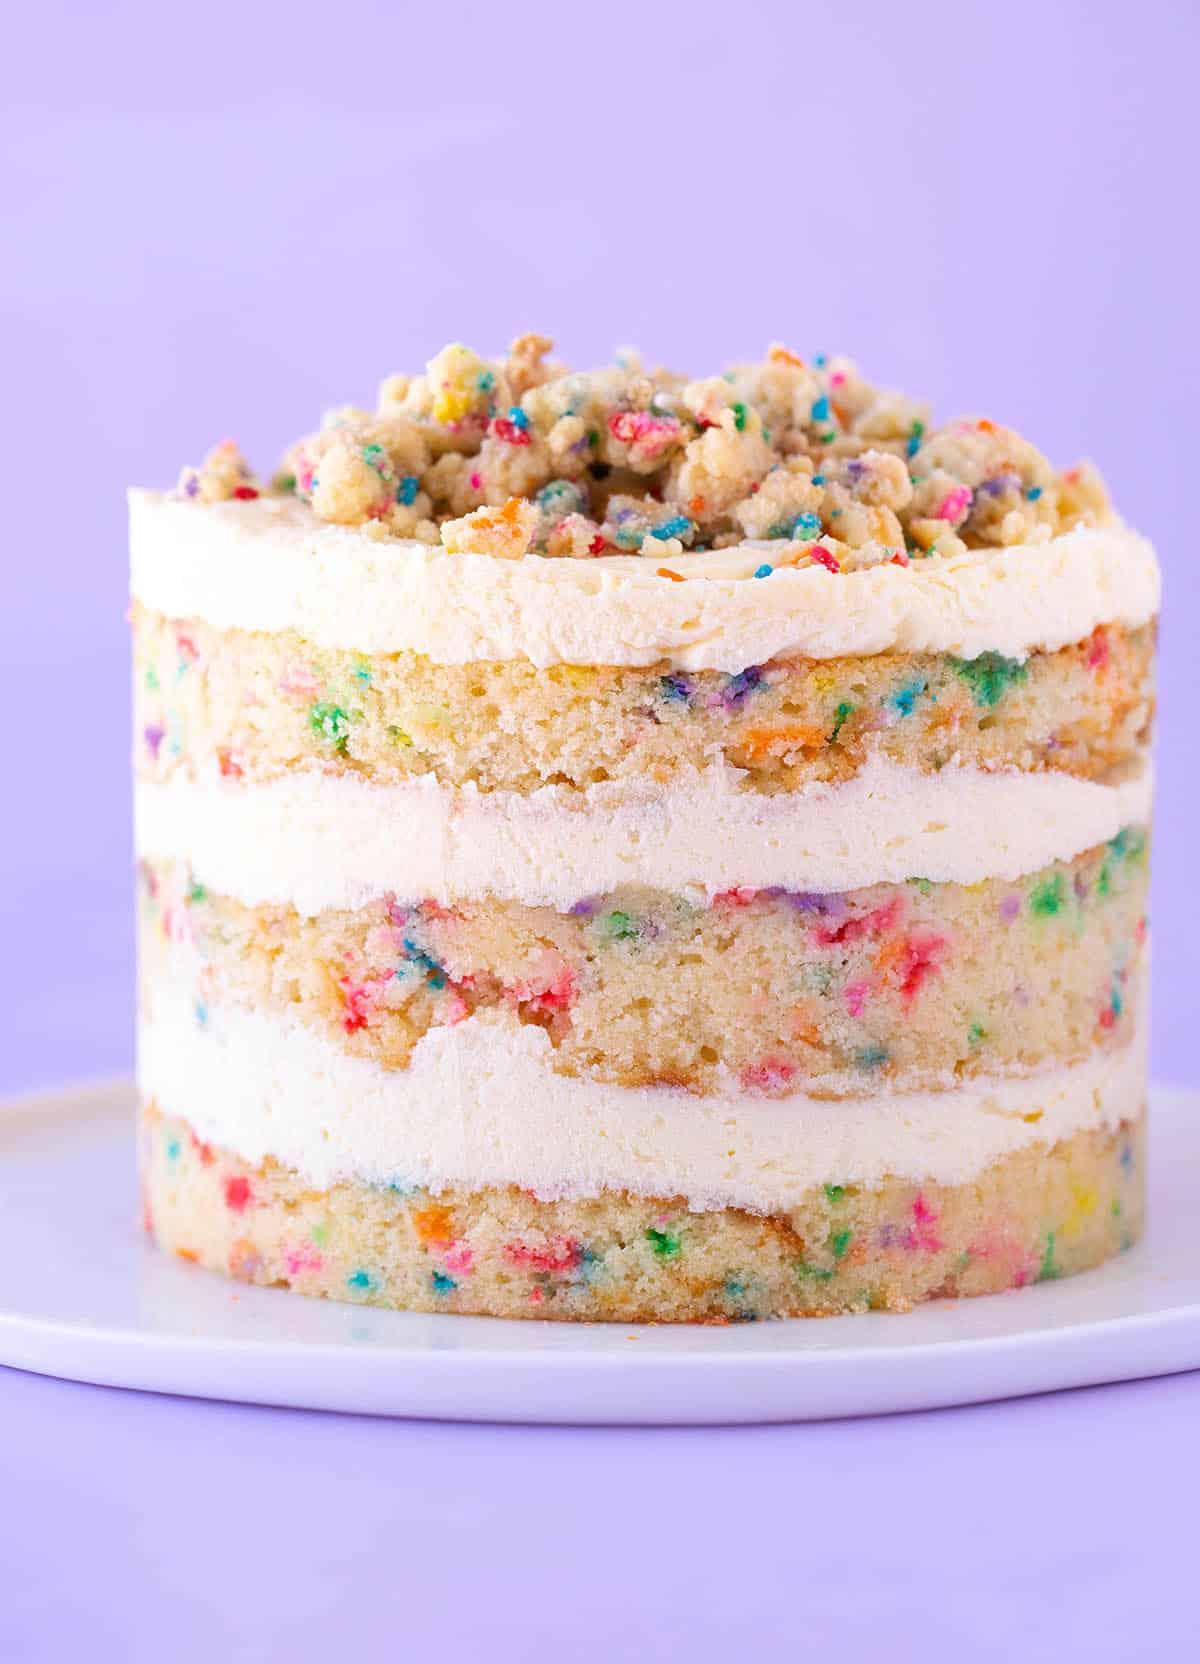 A beautiful homemade Milk Bar Birthday Cake on a purple background.